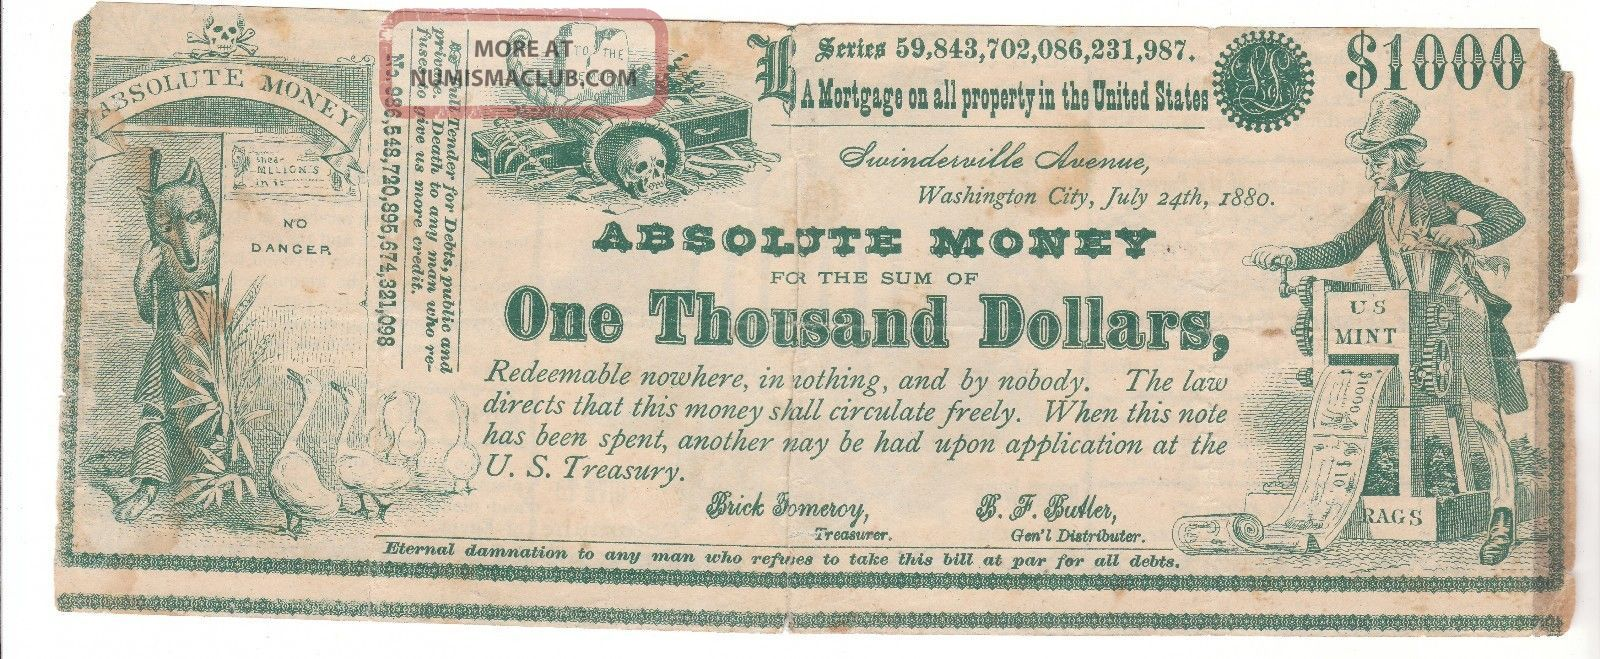 Hoover essay political money? Ks4 creative writing tasks.